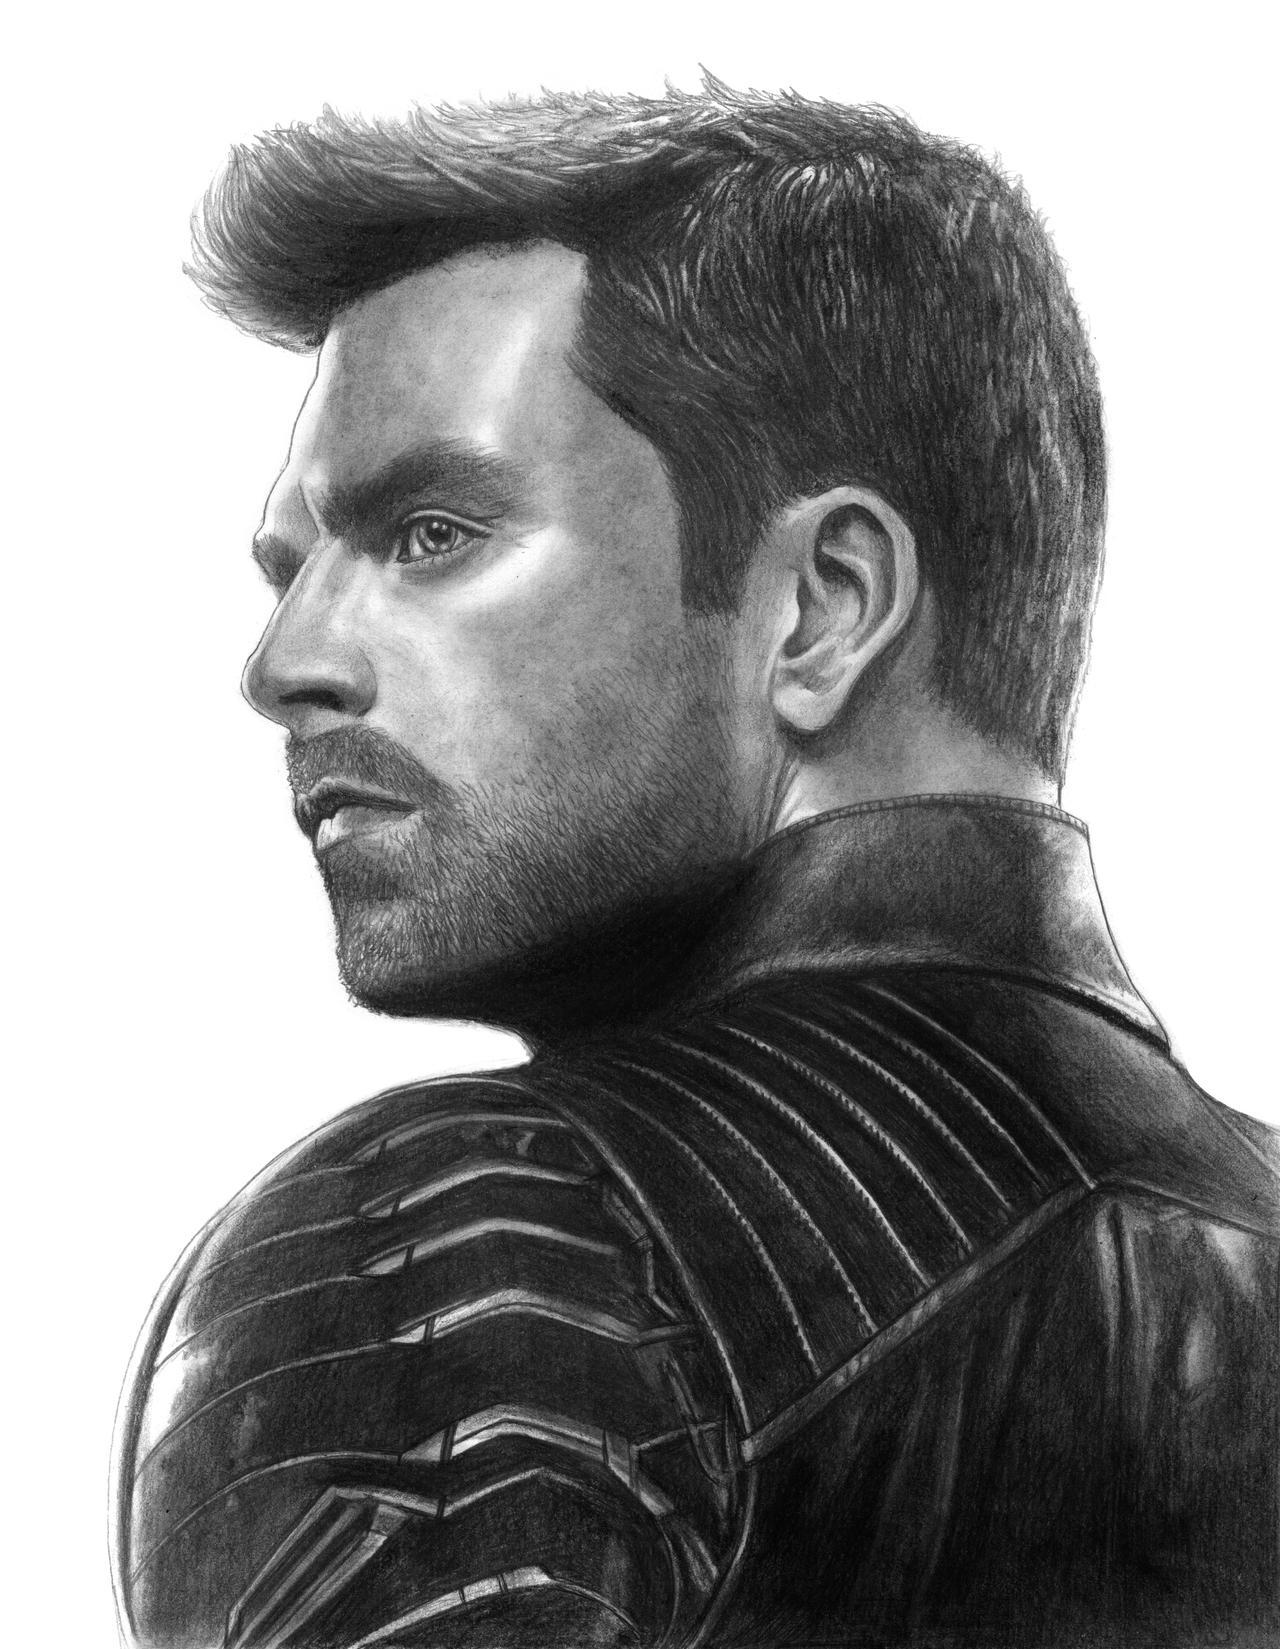 The Winter Soldier (Bucky Barnes)